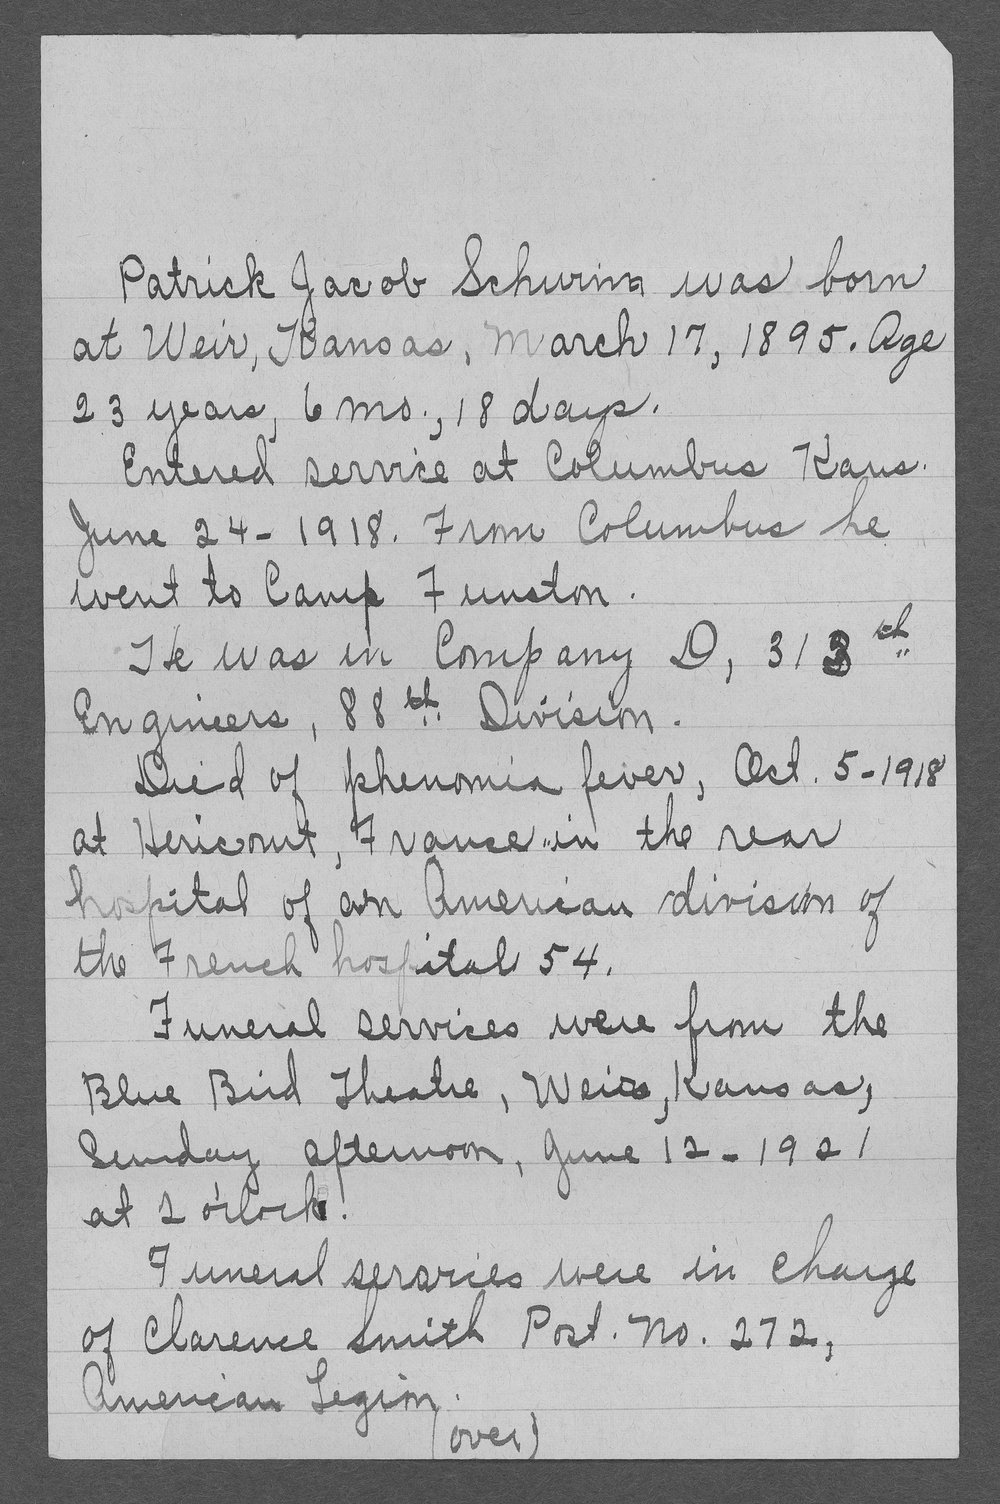 Patrick Jacob Schwinn, World War I soldier - 3